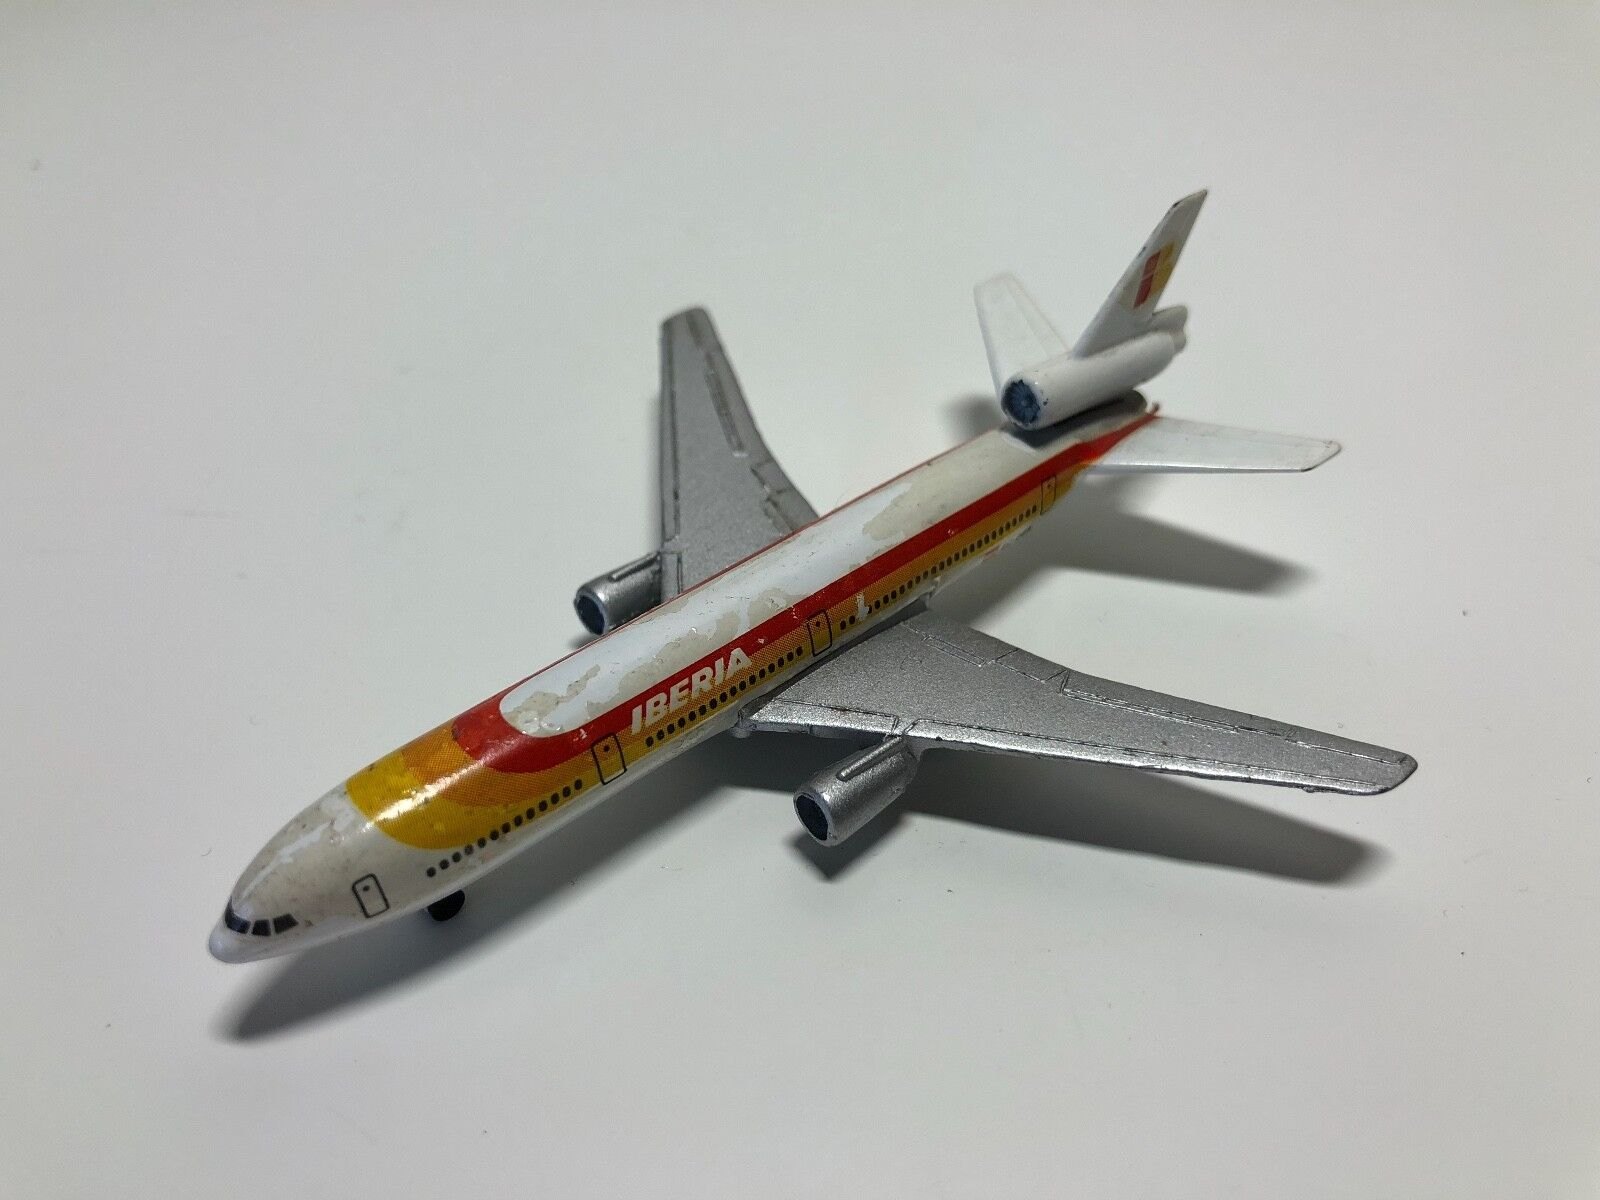 Gebraucht - Miniatur Flugzeug Iberia - Douglas DC10 - Schabak - airplane